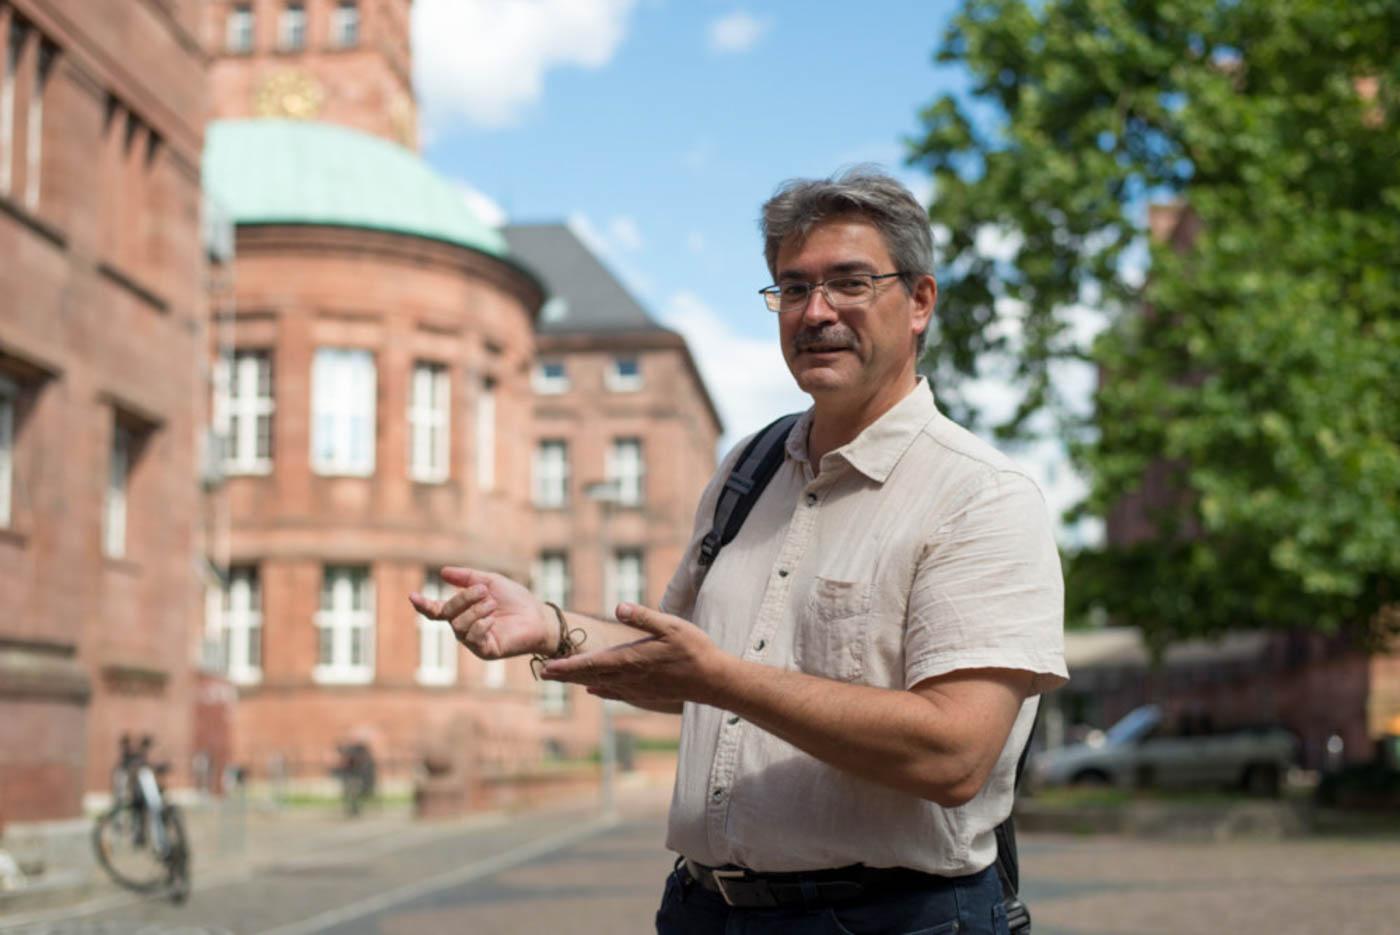 Herr Faller gestikuliert vor KGI